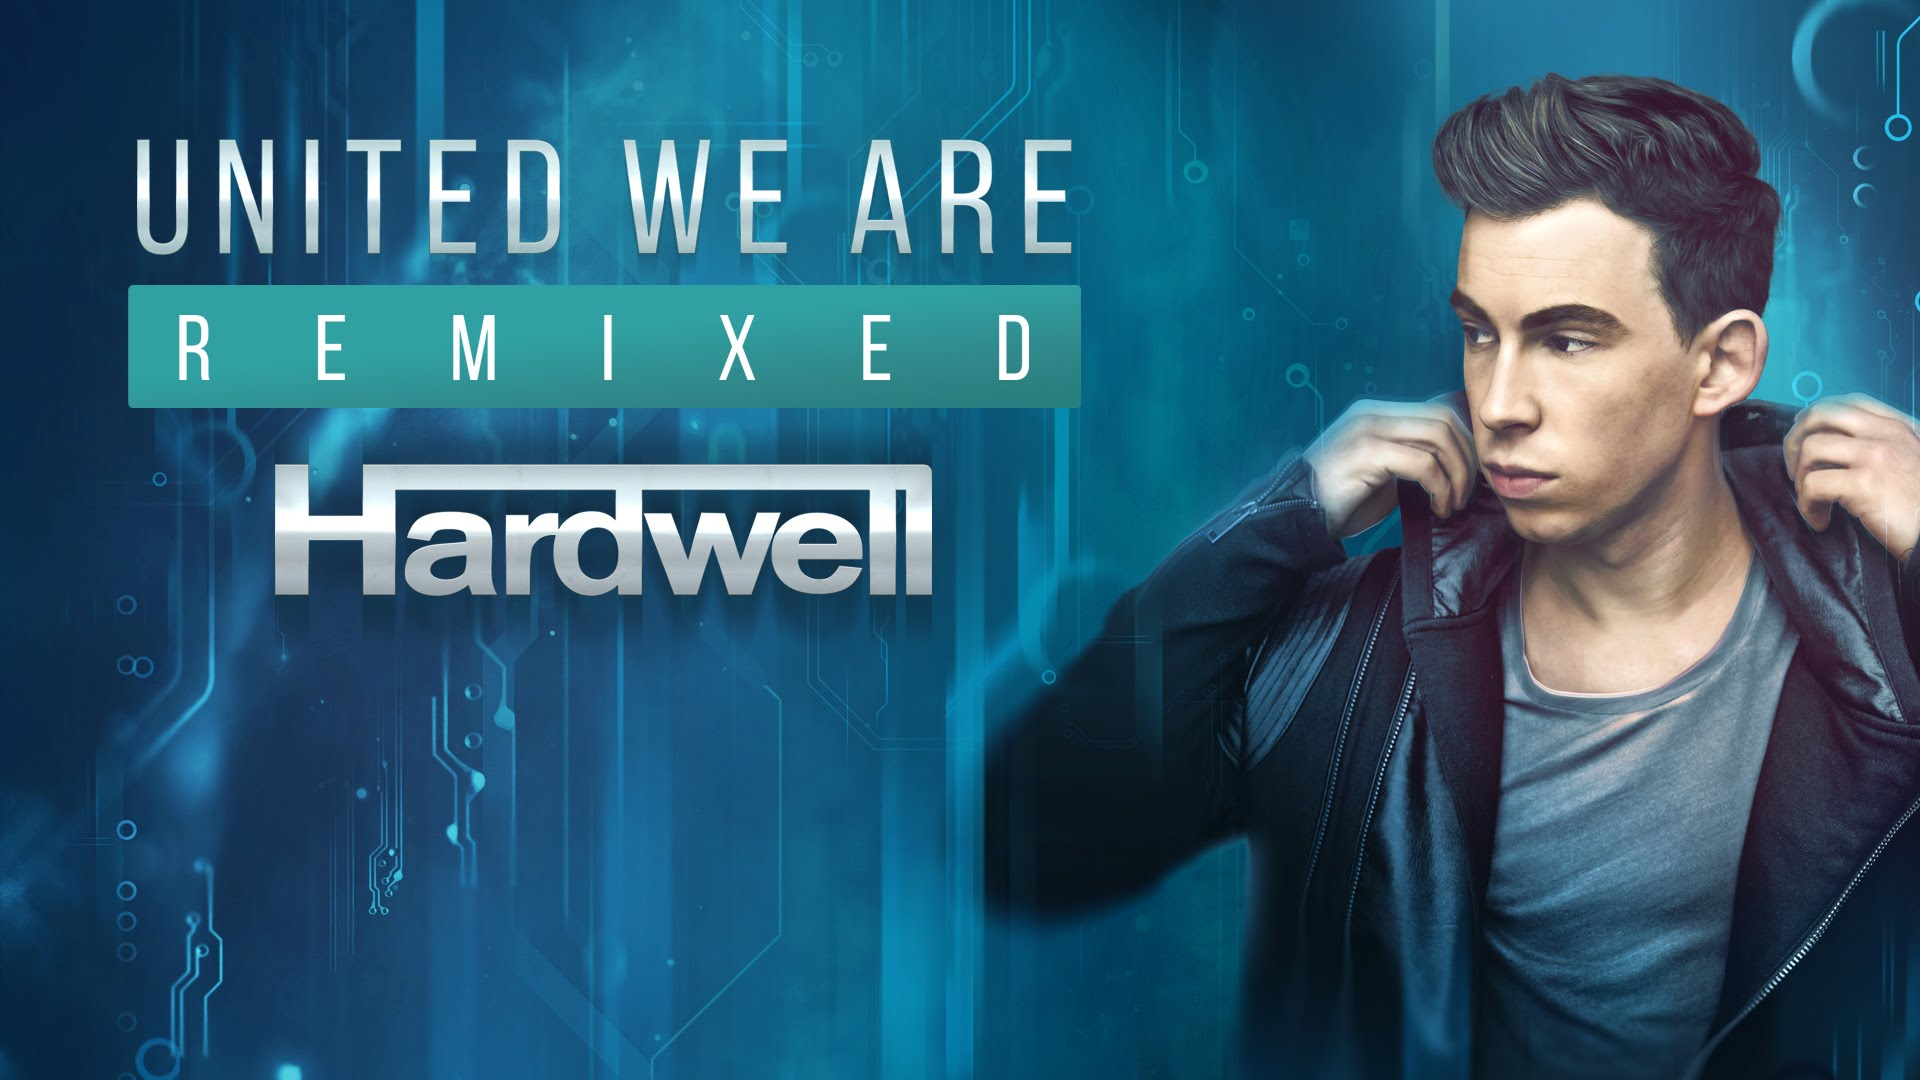 Hardwell – United We Are (Remixed)